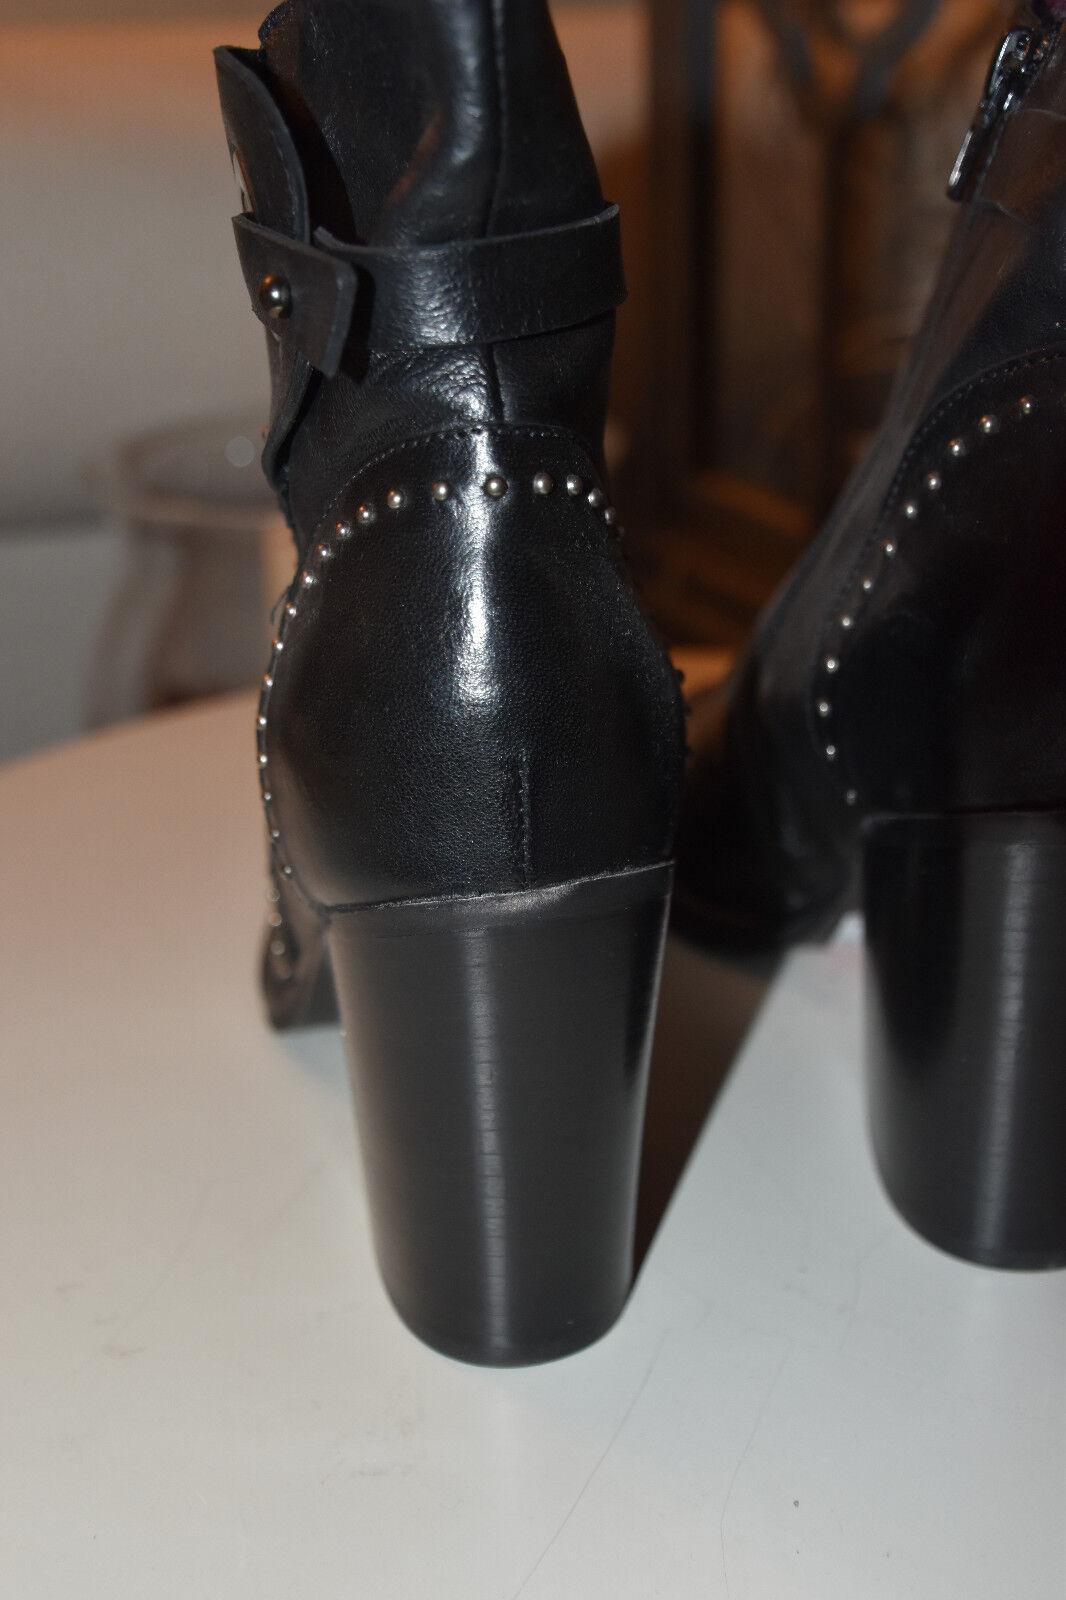 Kim Kay Scarpa London Scarpa Kay in Pelle Basse Scarpa STIVALETTI BORCHIE TG. 40 Nero Nuovo 950305